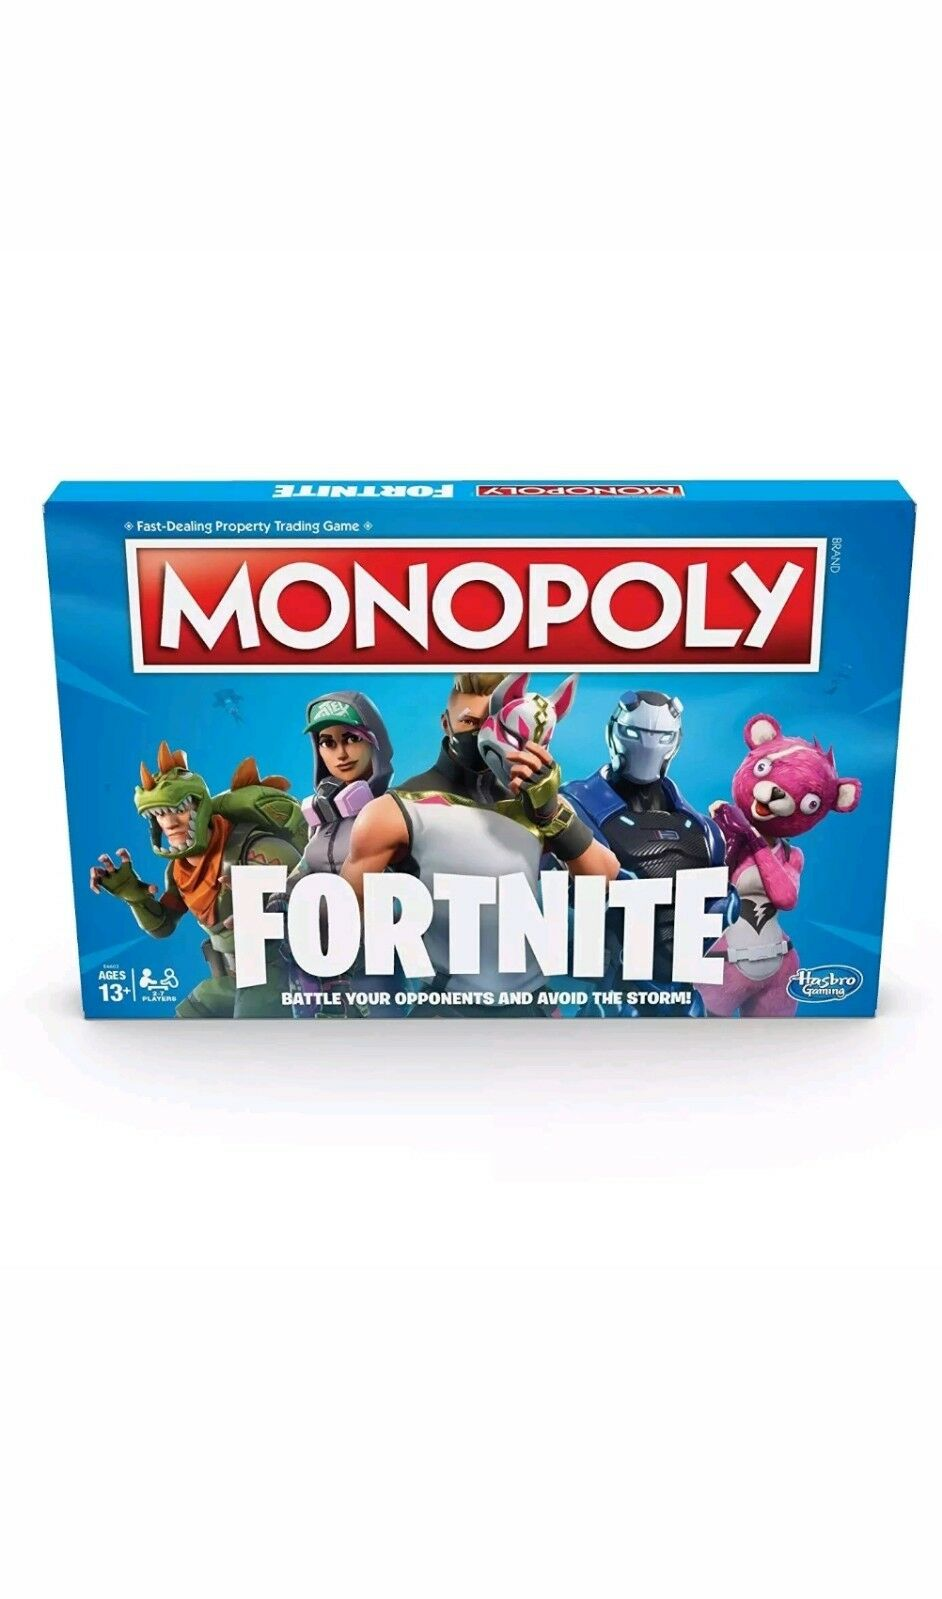 Monopol fortnite ausgabe brettspiel, multi - farbe in der hand